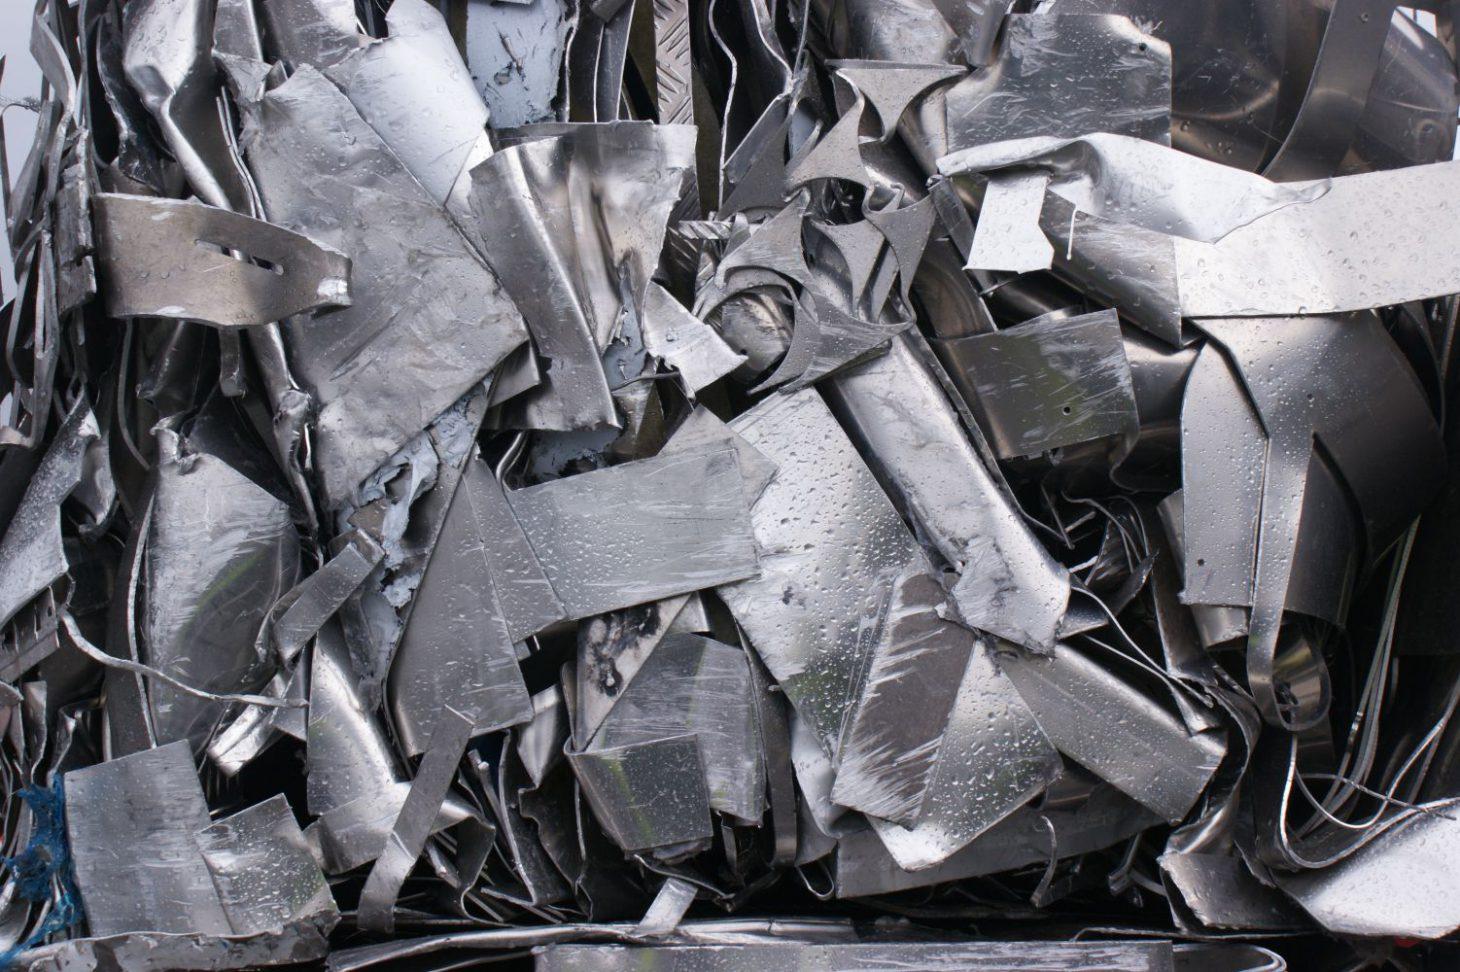 Scrap Stainless Steel